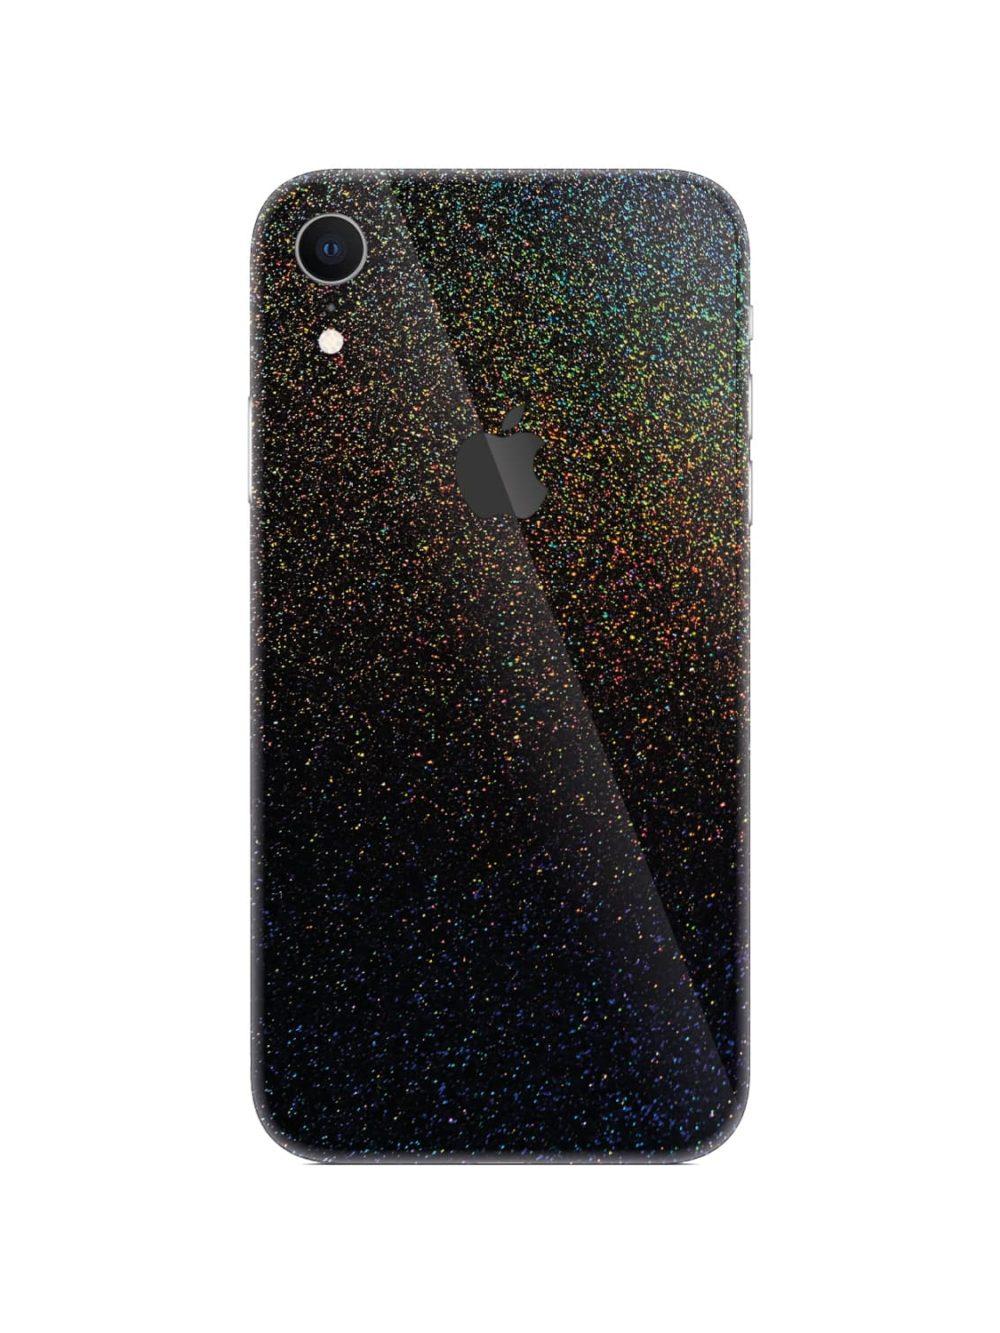 Apple iPhone XR Cosmic Morpheus Black Vinyl Skin Wrap